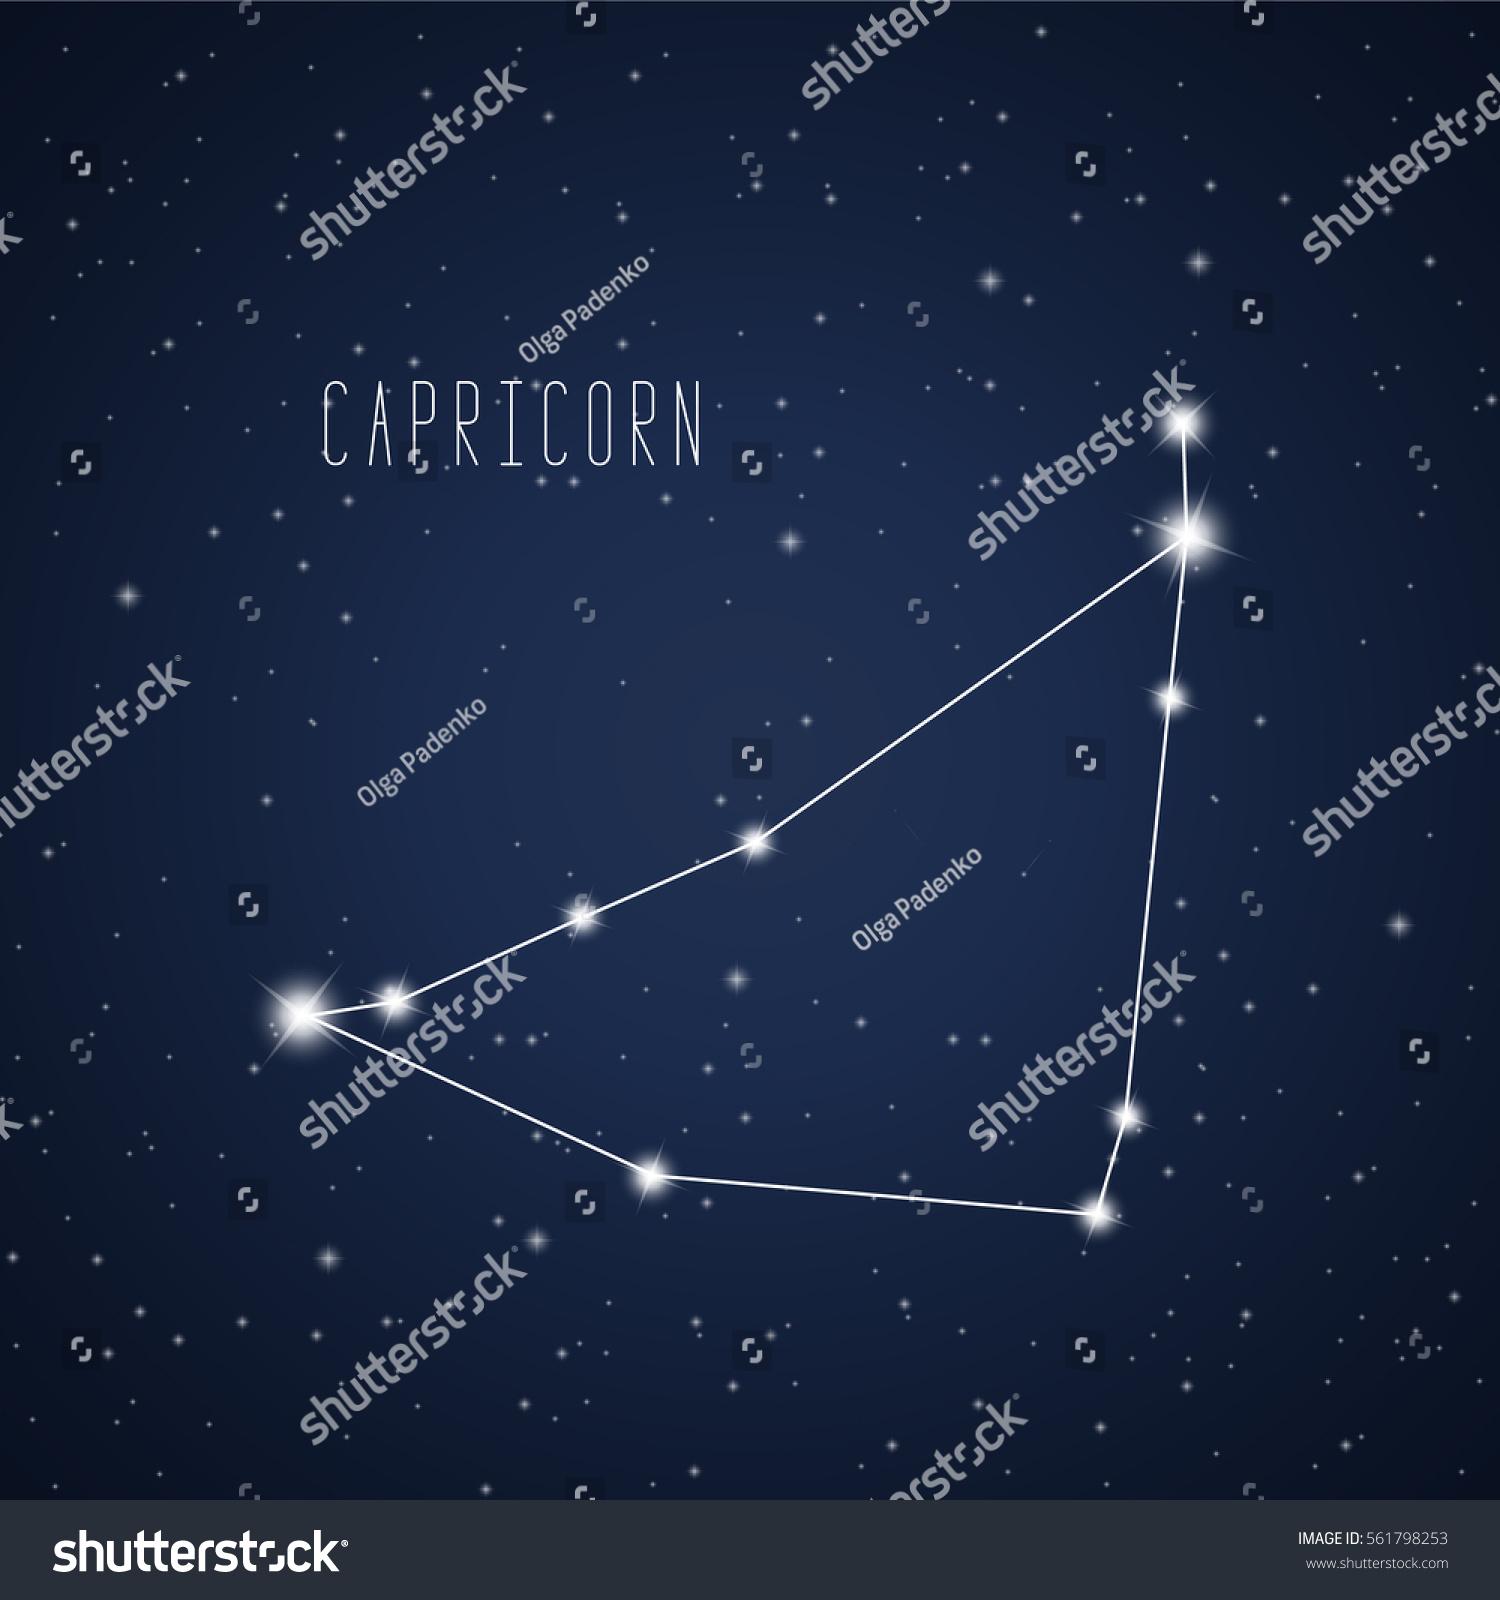 Capricorn - mystery constellation 78